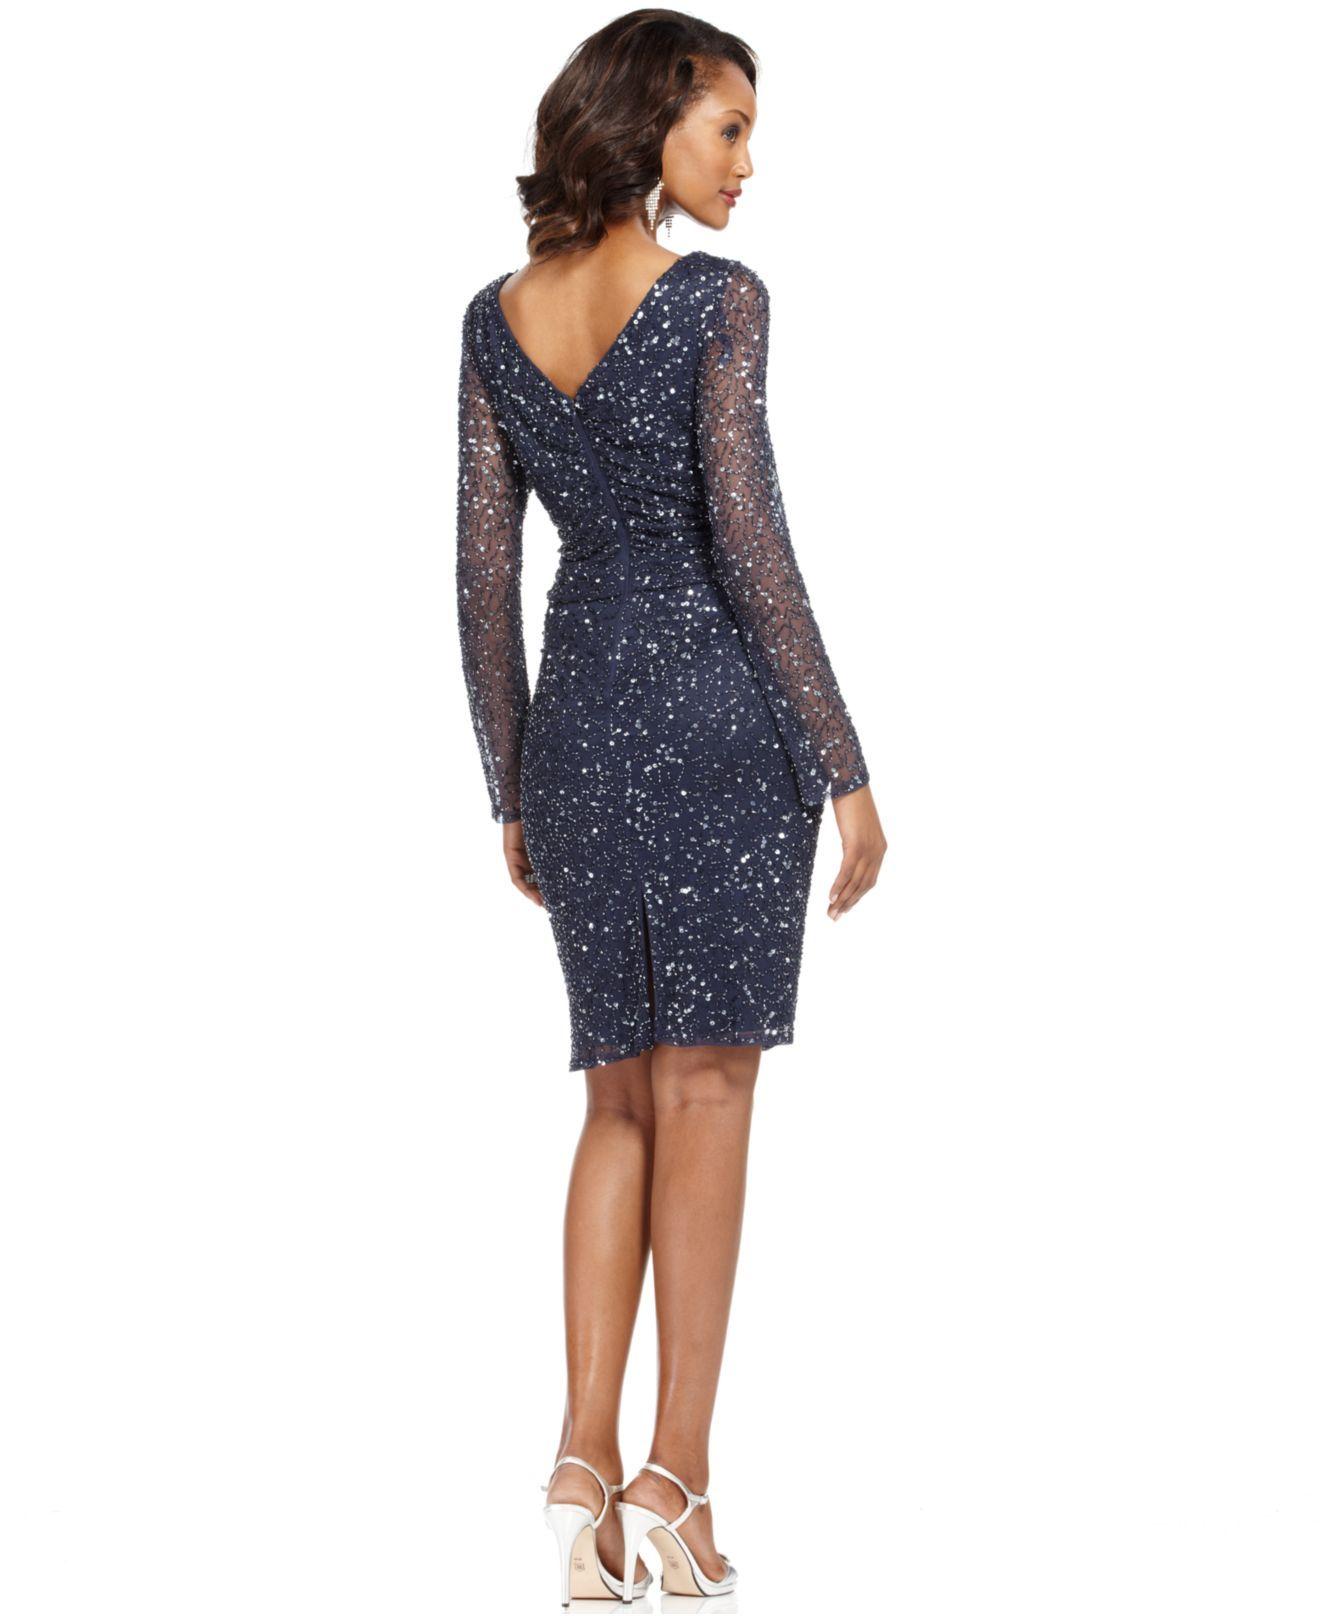 Patra Dress, Long-Sleeve Beaded Sequin - Womens Dresses - Macy's - ELEGANT!